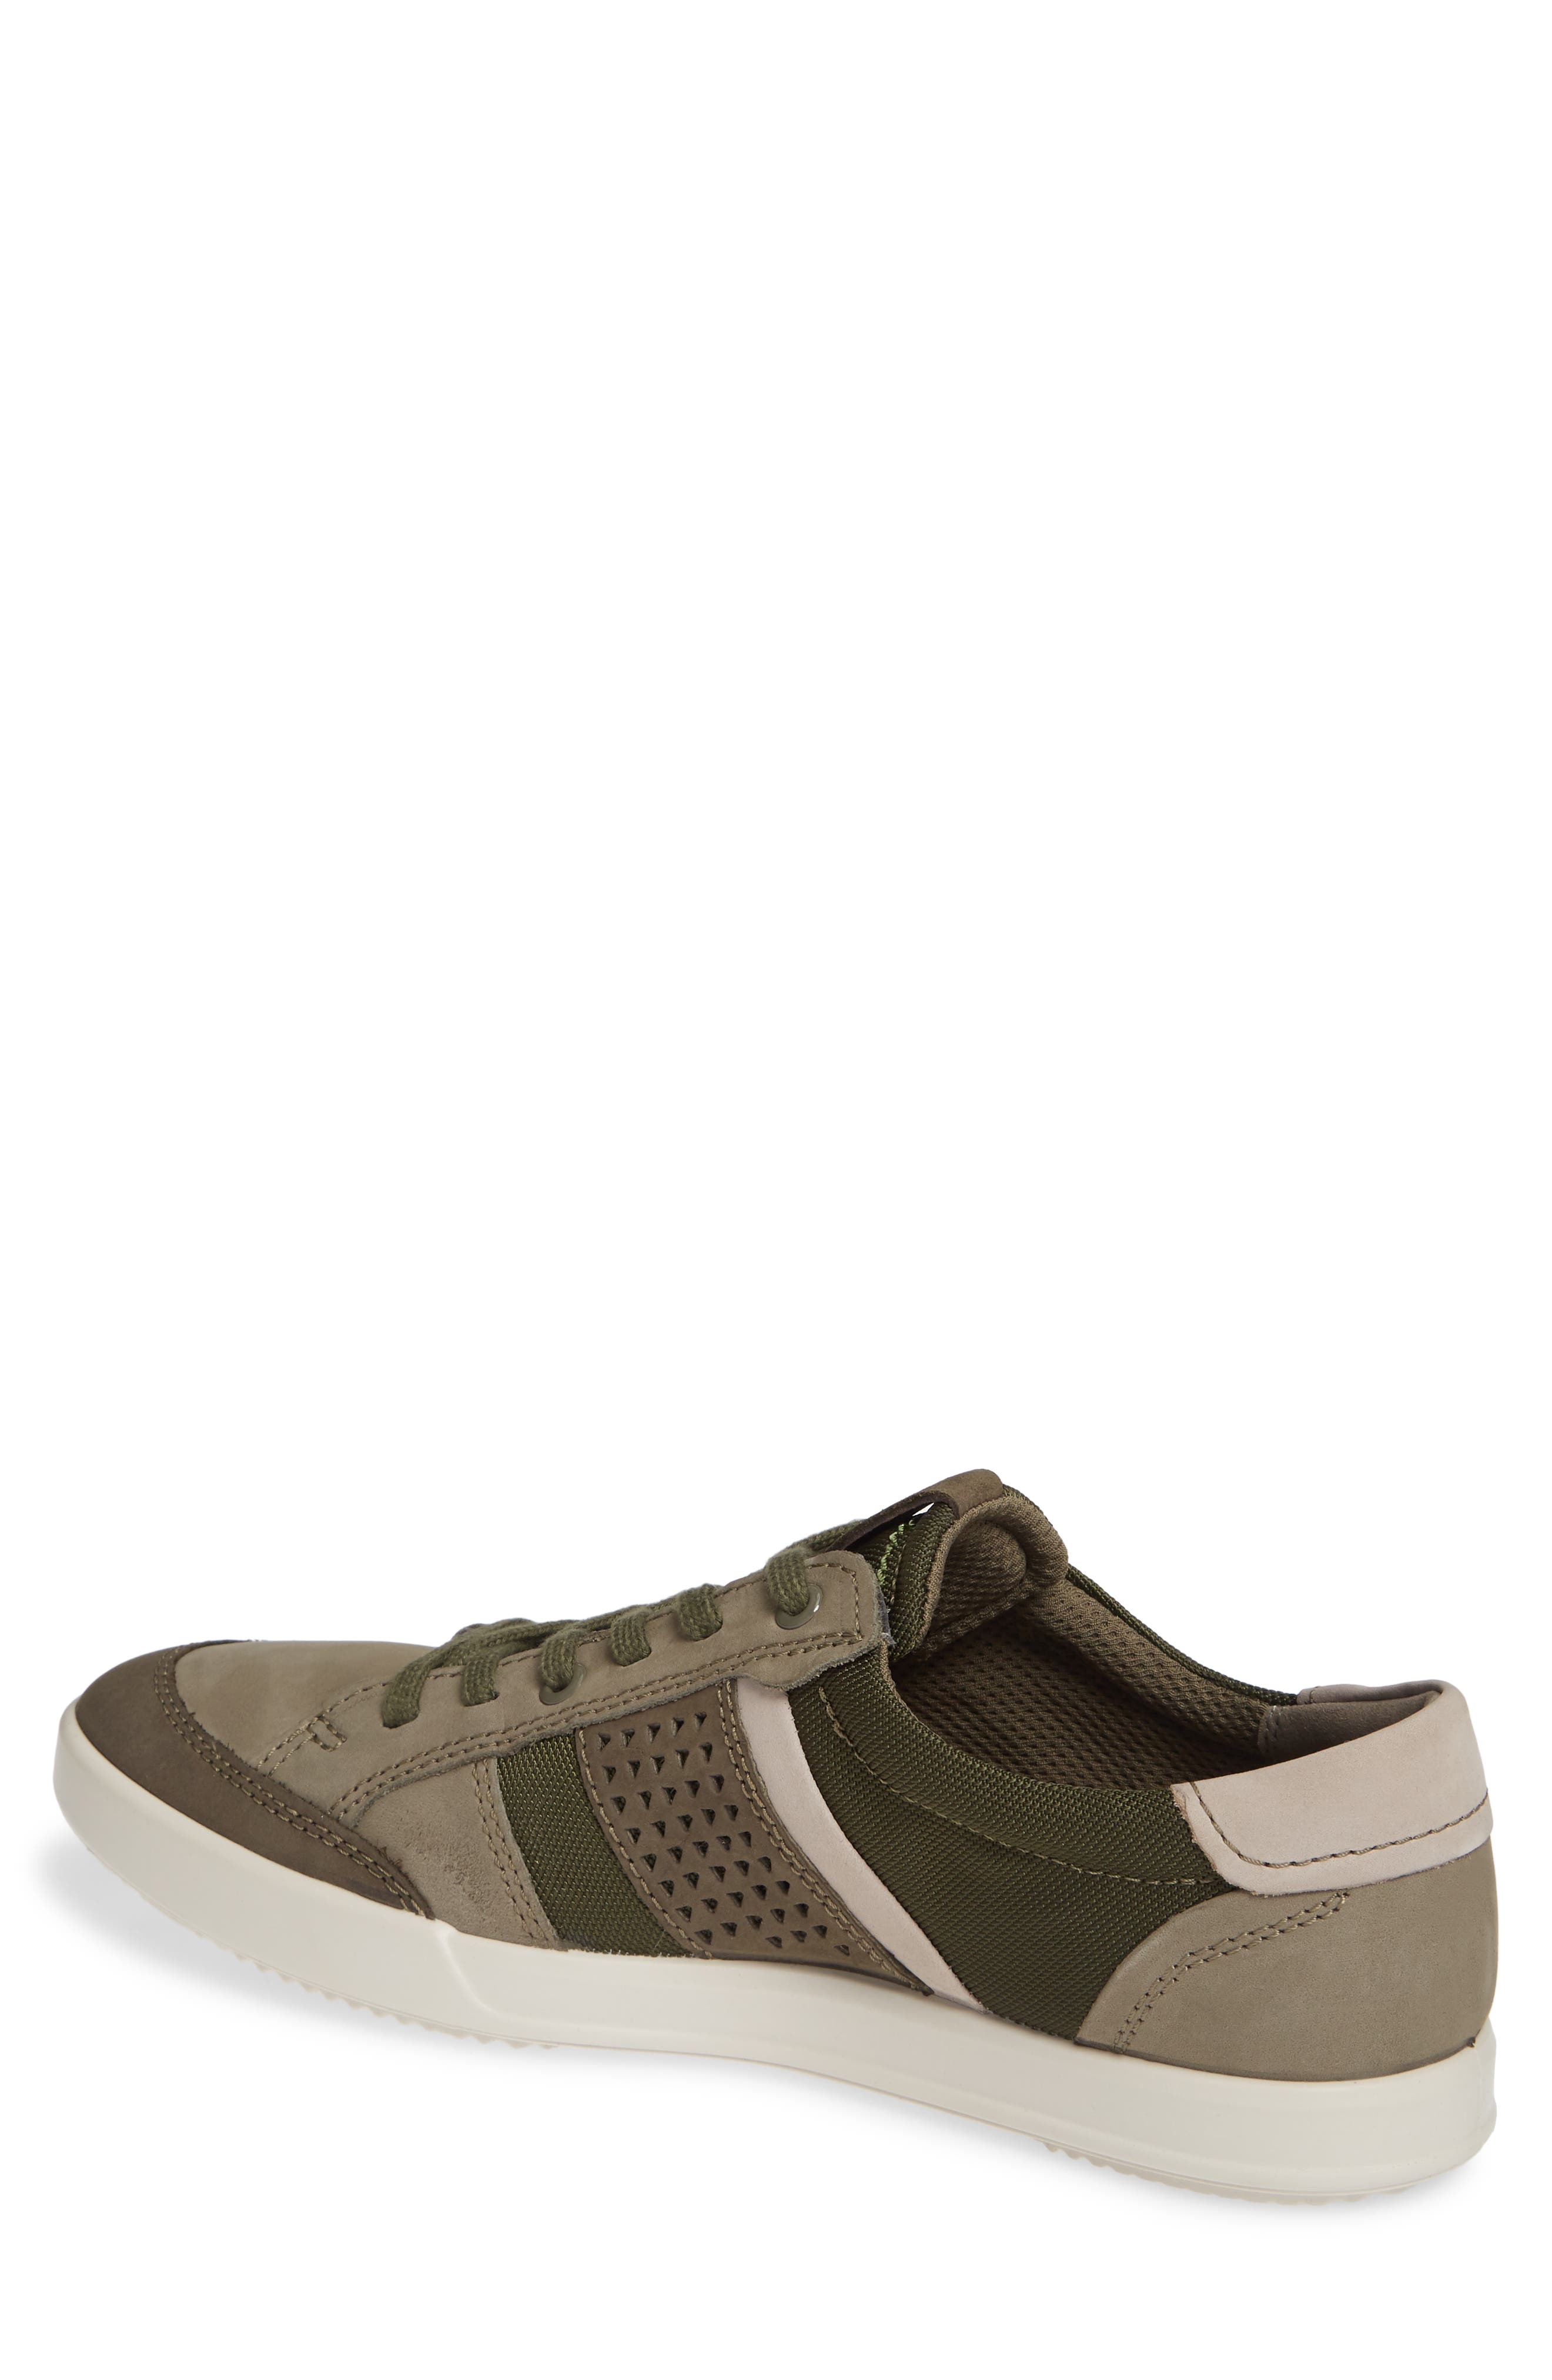 ECCO, Collin 2.0 Sneaker, Alternate thumbnail 2, color, TARMAC LEATHER